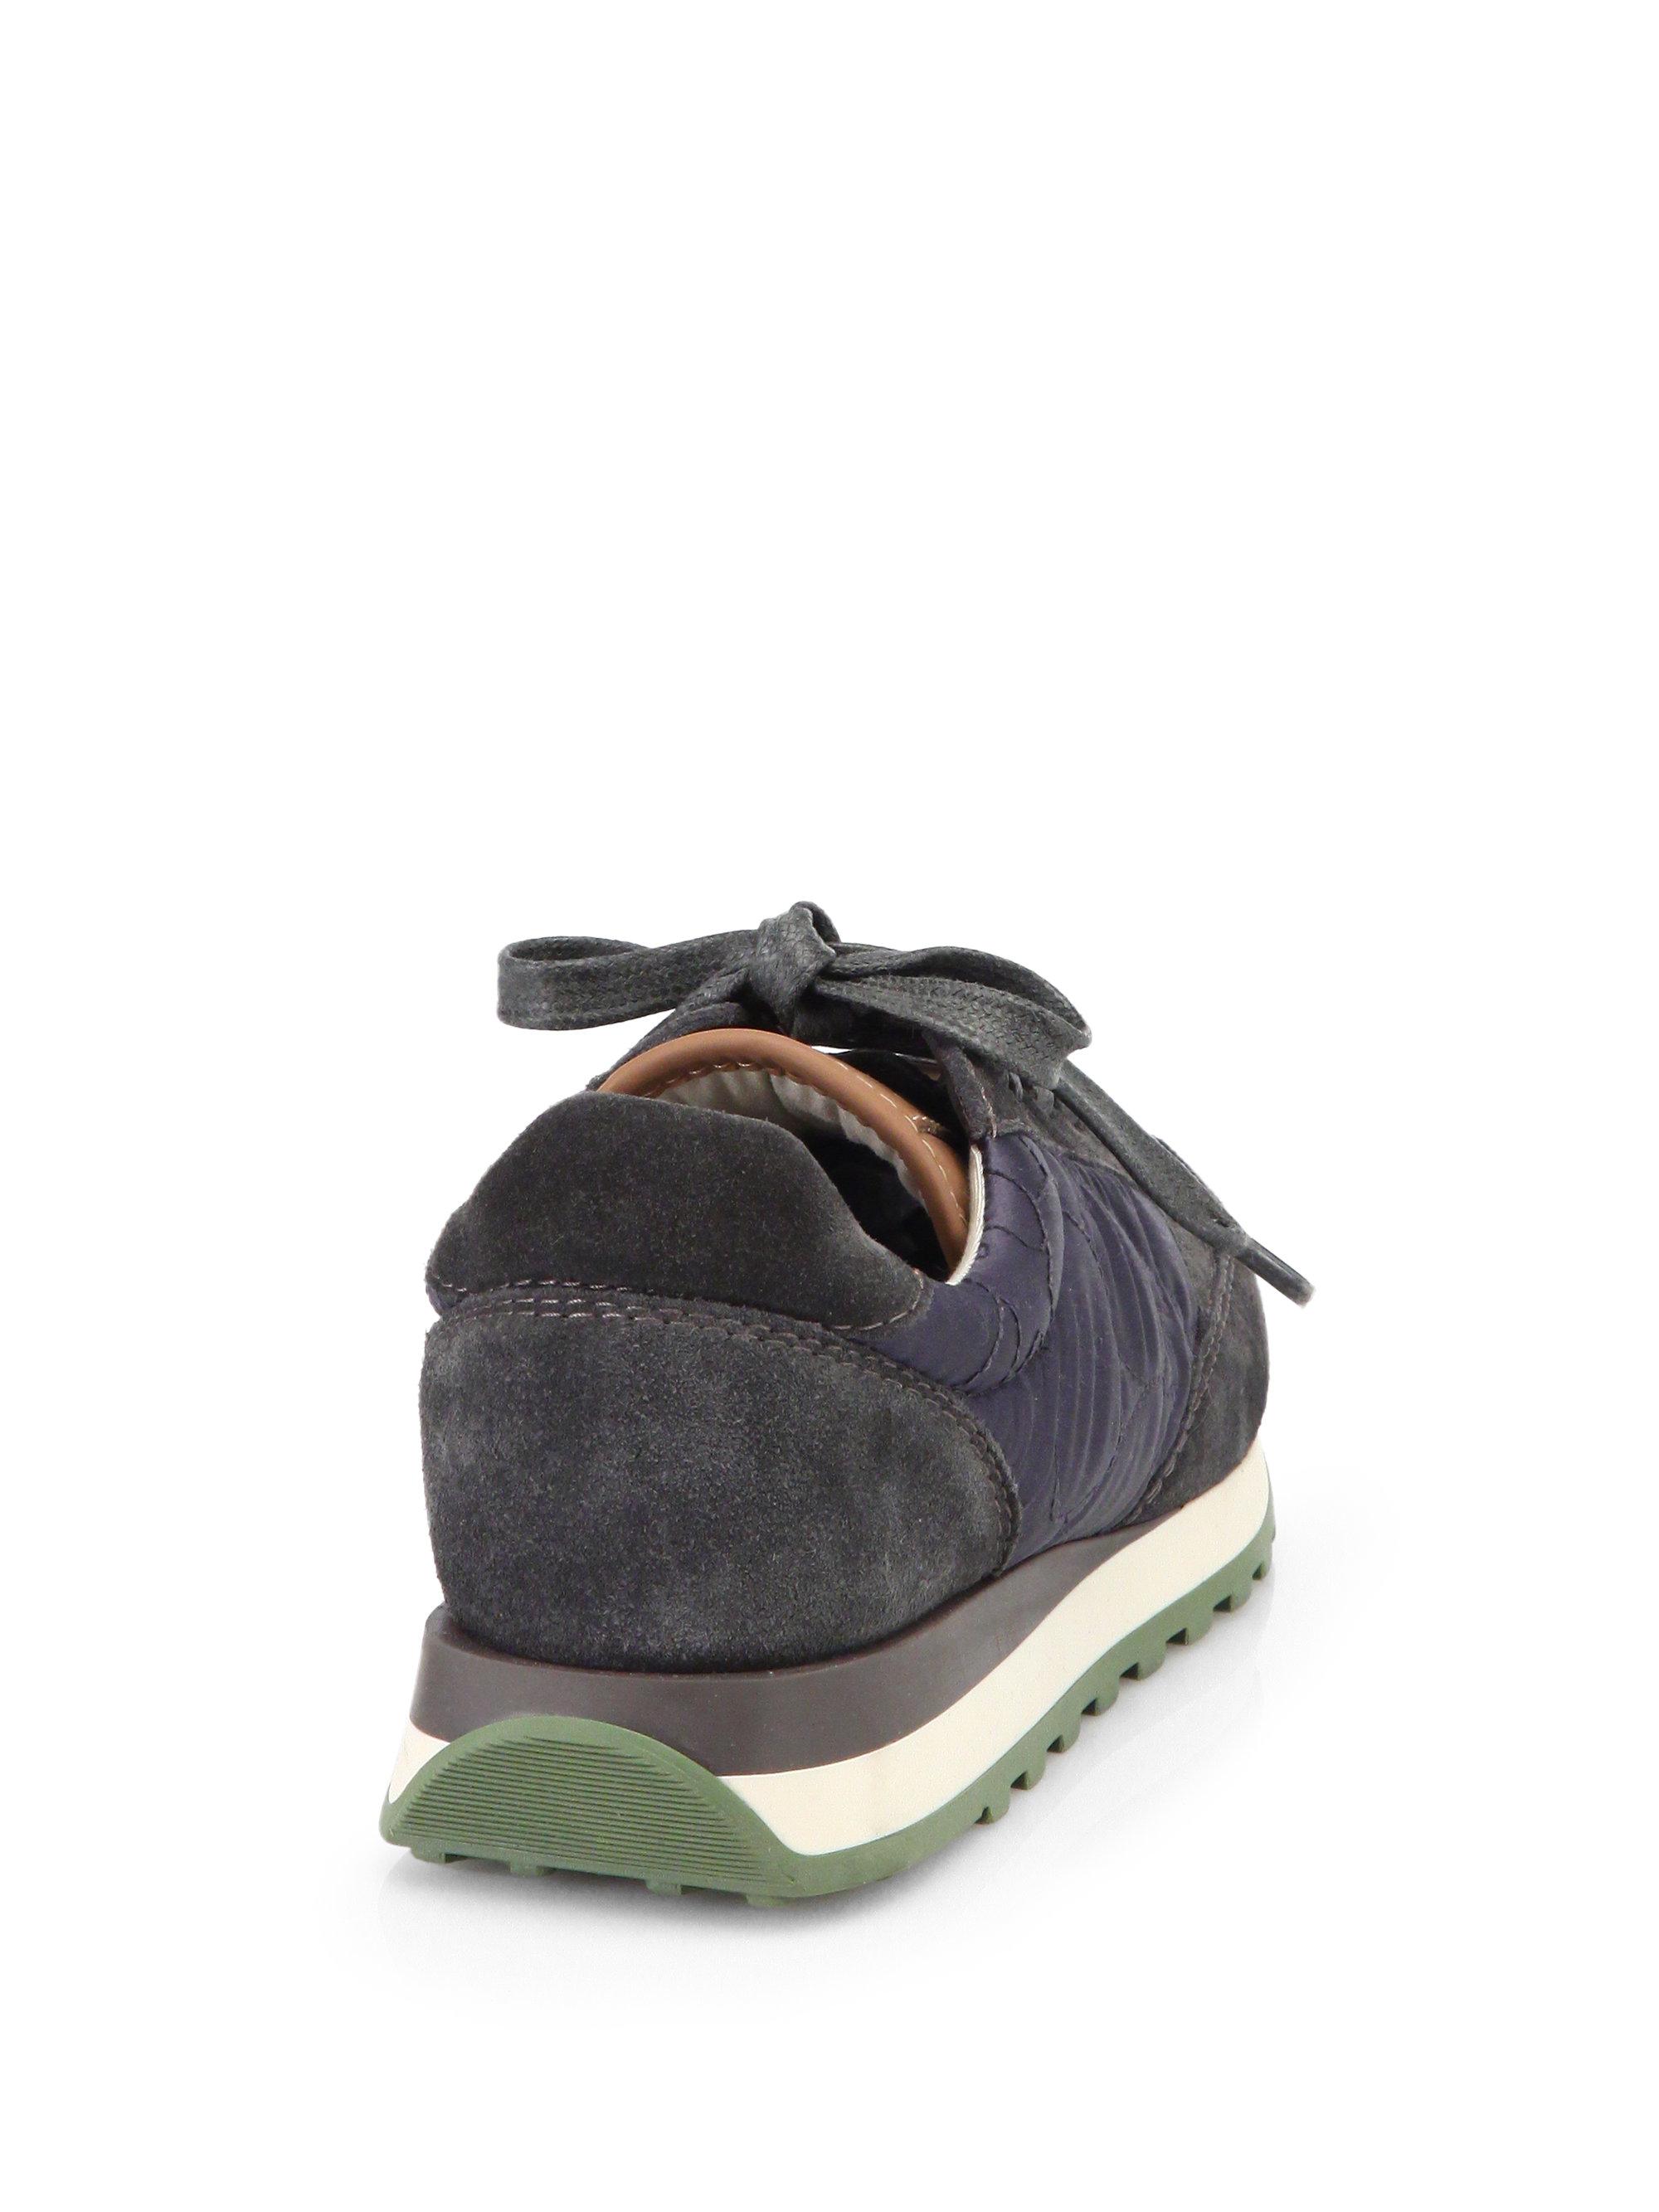 Brunello Cucinelli Mixed Media Suede Sneakers vkkpdBHe